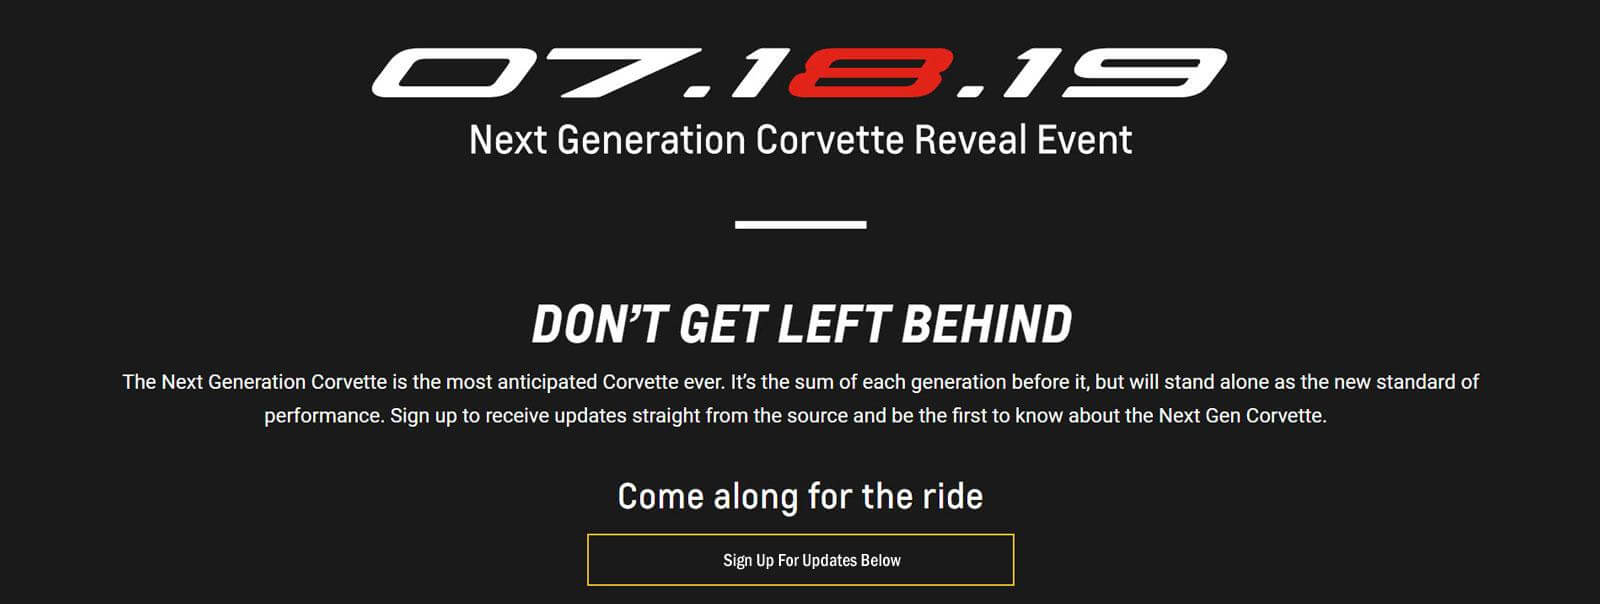 July 18, 2019 Next Generation Corvette Reveal Event